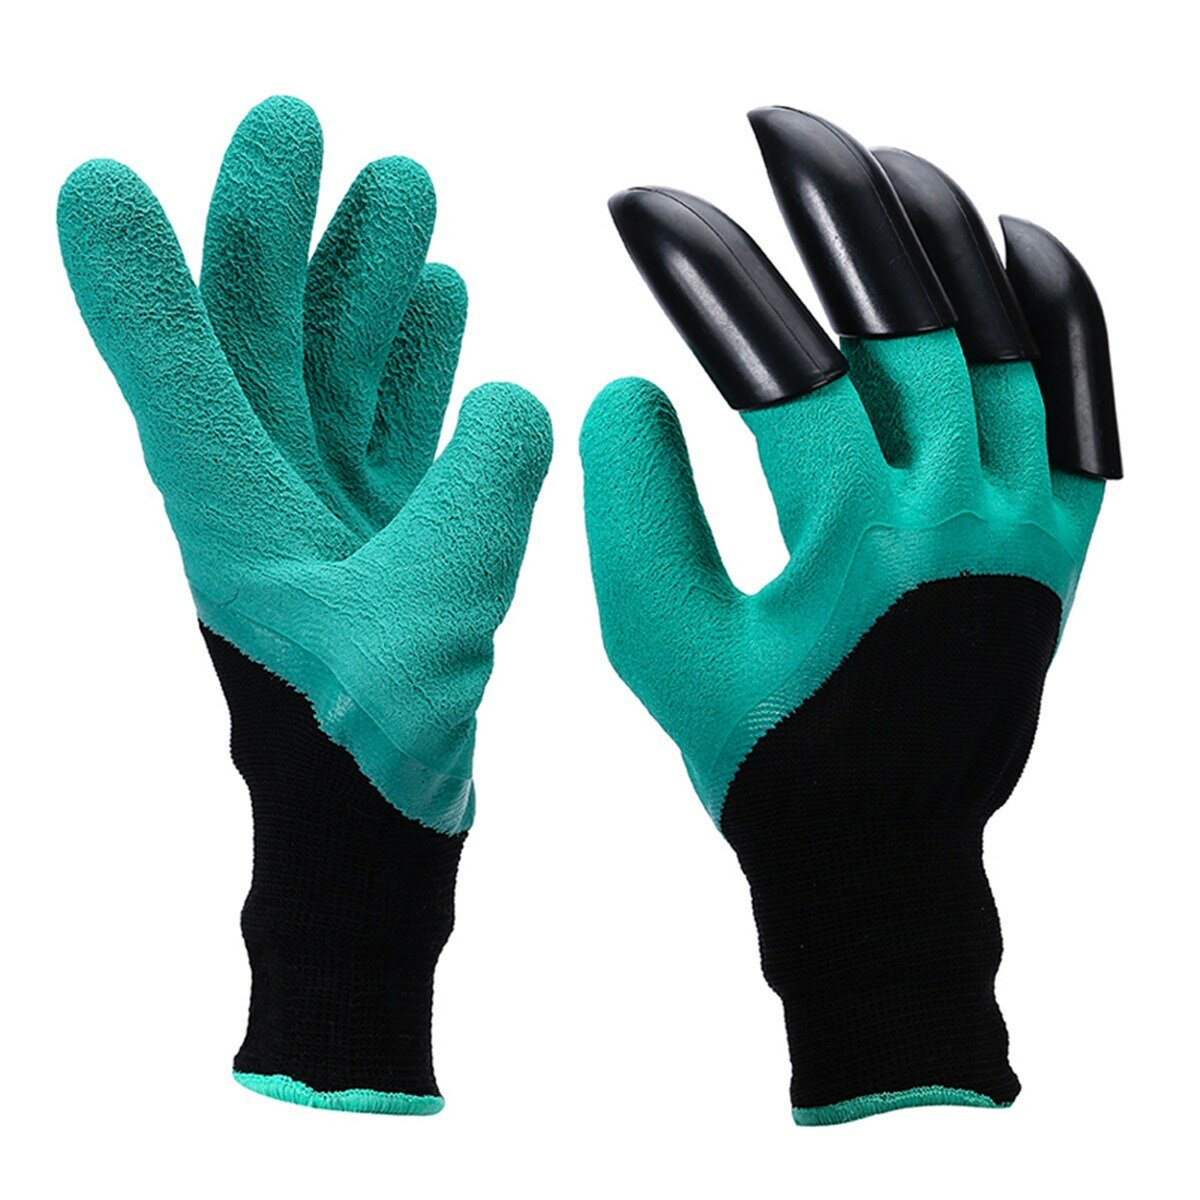 Перчатка для работы в саду и огороде Garden Genie Gloves в Чернушке